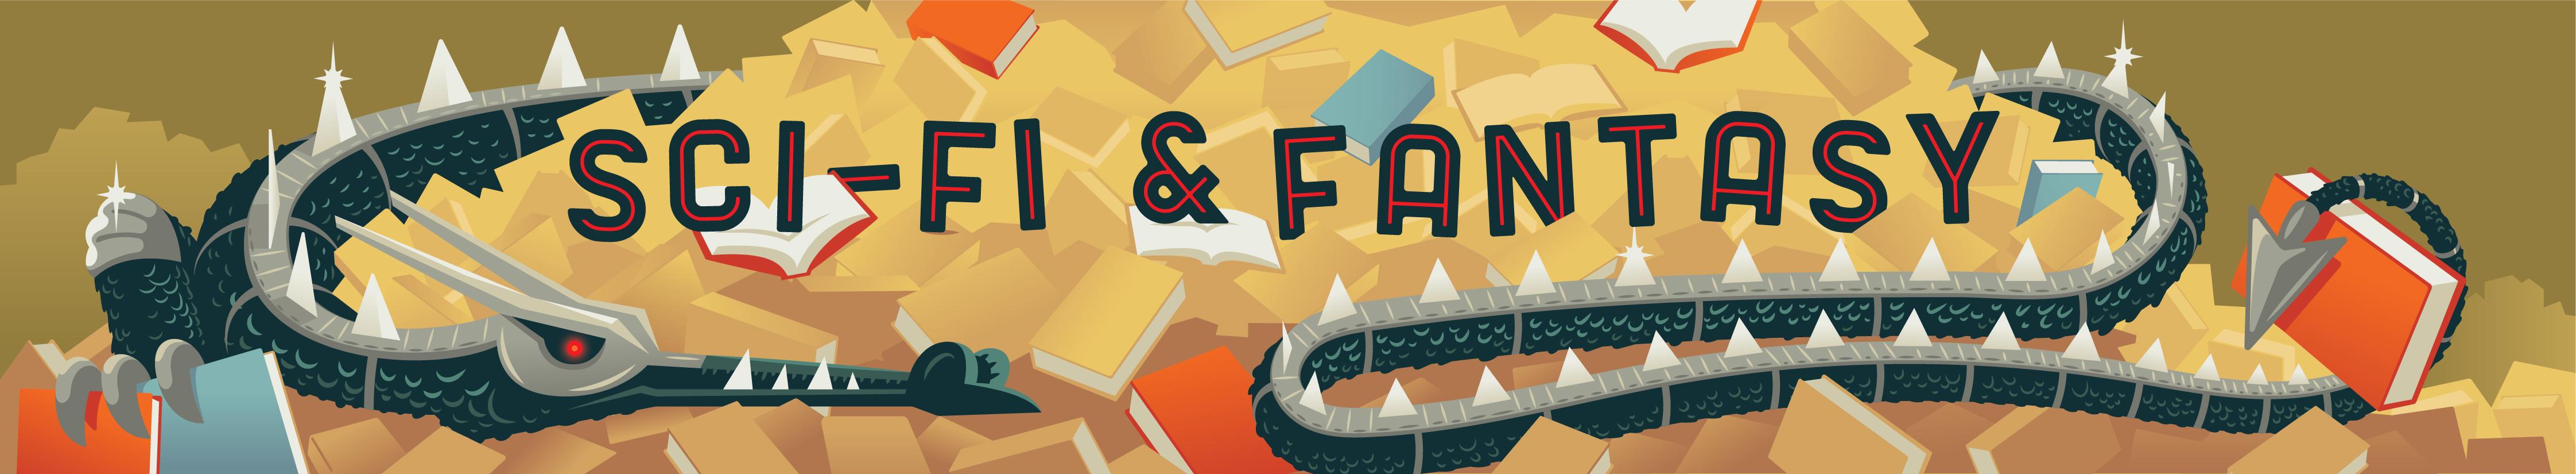 Goodreads SFF Week 2018